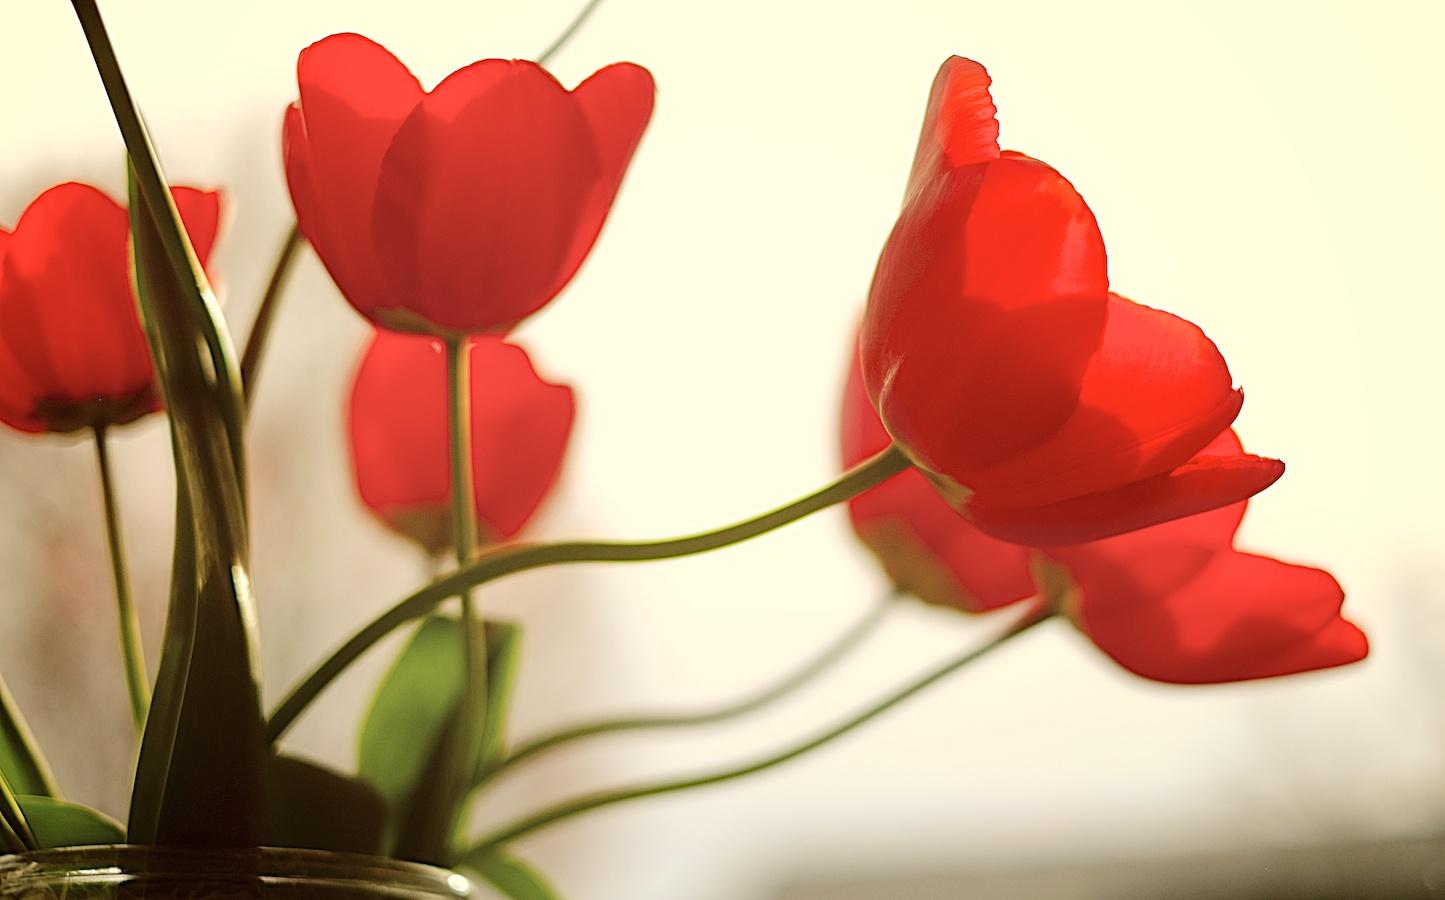 Tulips against the sun. Fujifilm X-E1, XF35mm f/1.4 @ f/1.4, 1/4000, ISO 200